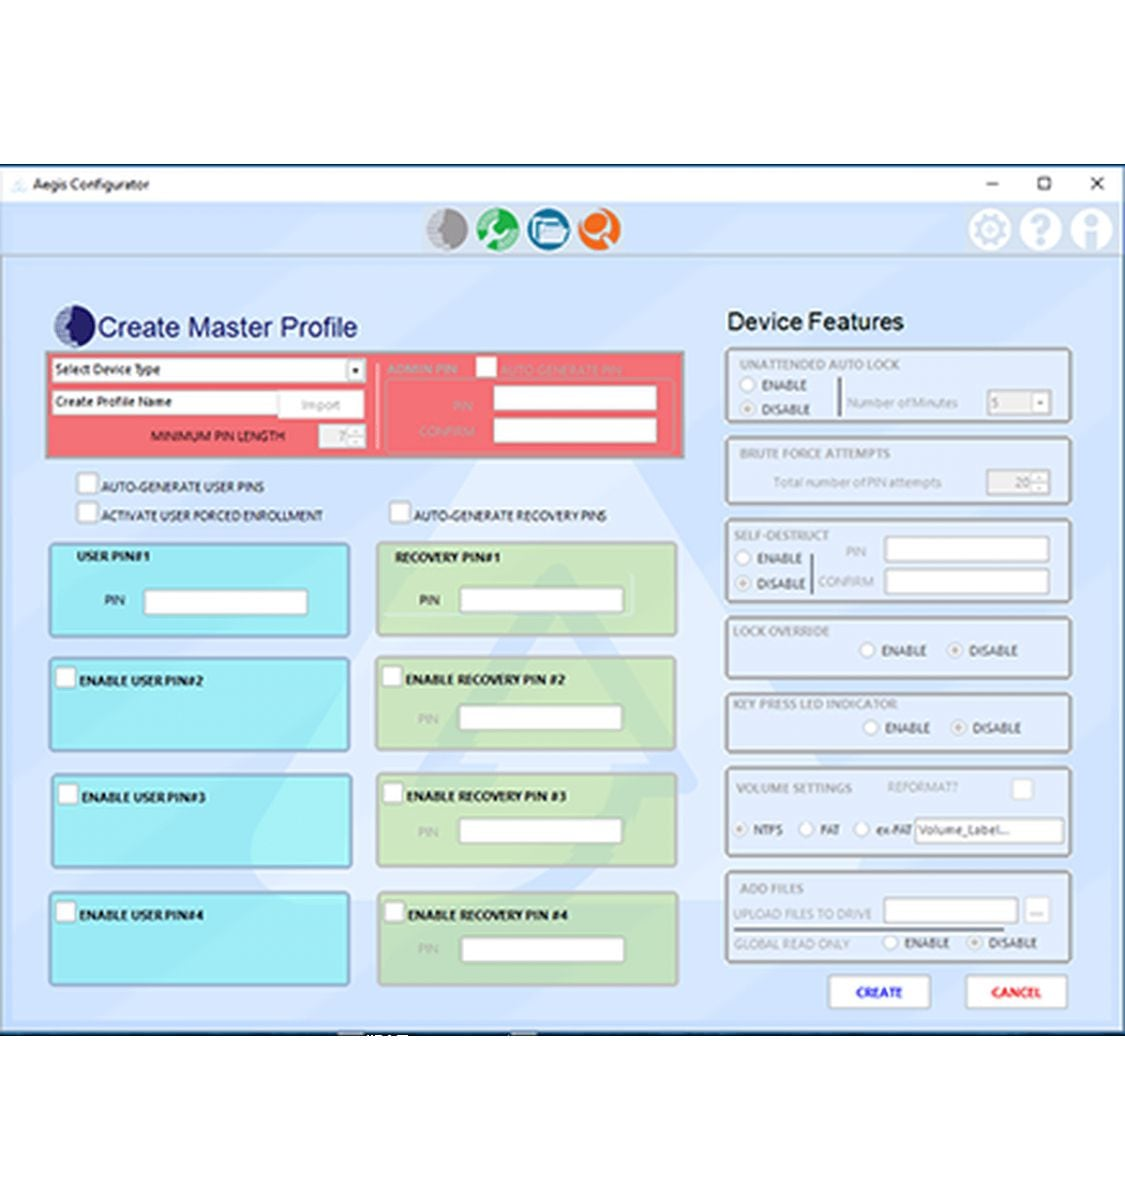 apricorn configurator central provisioning tool